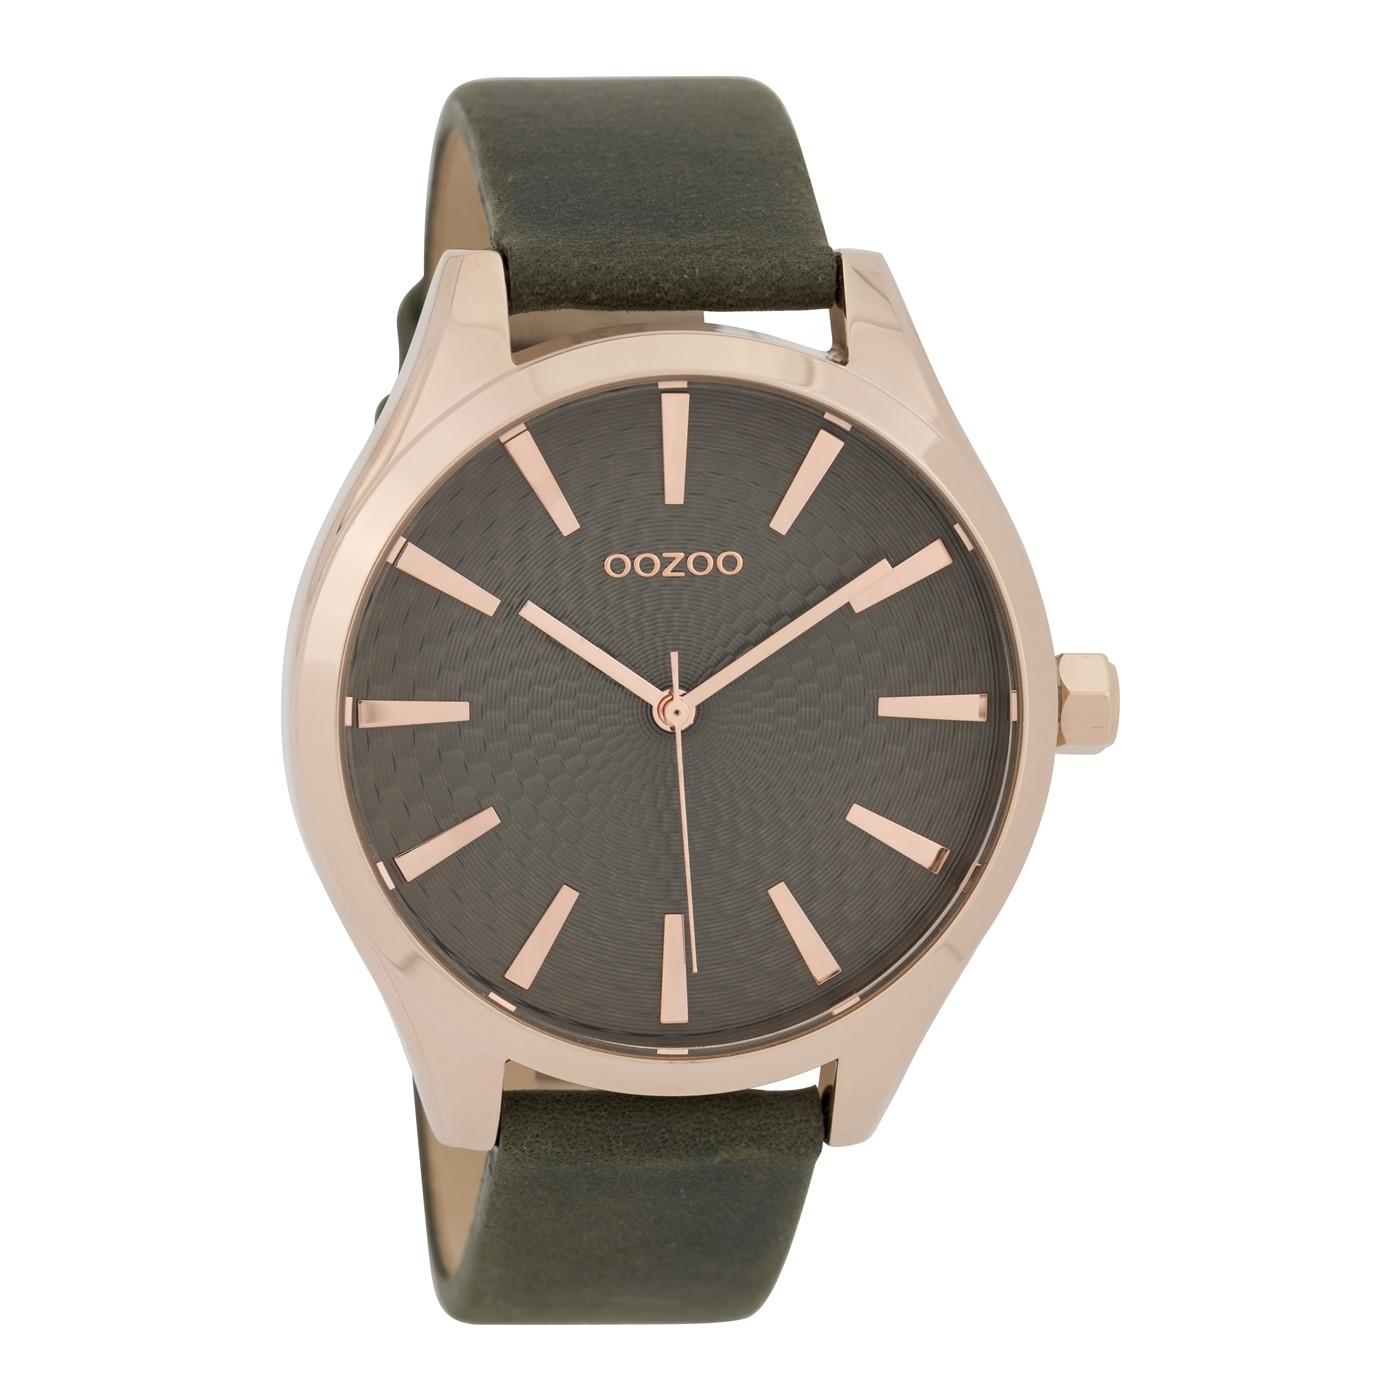 OOZOO Horloge Timepieces Collection staal leder rosekleurig donkergrijs C9688